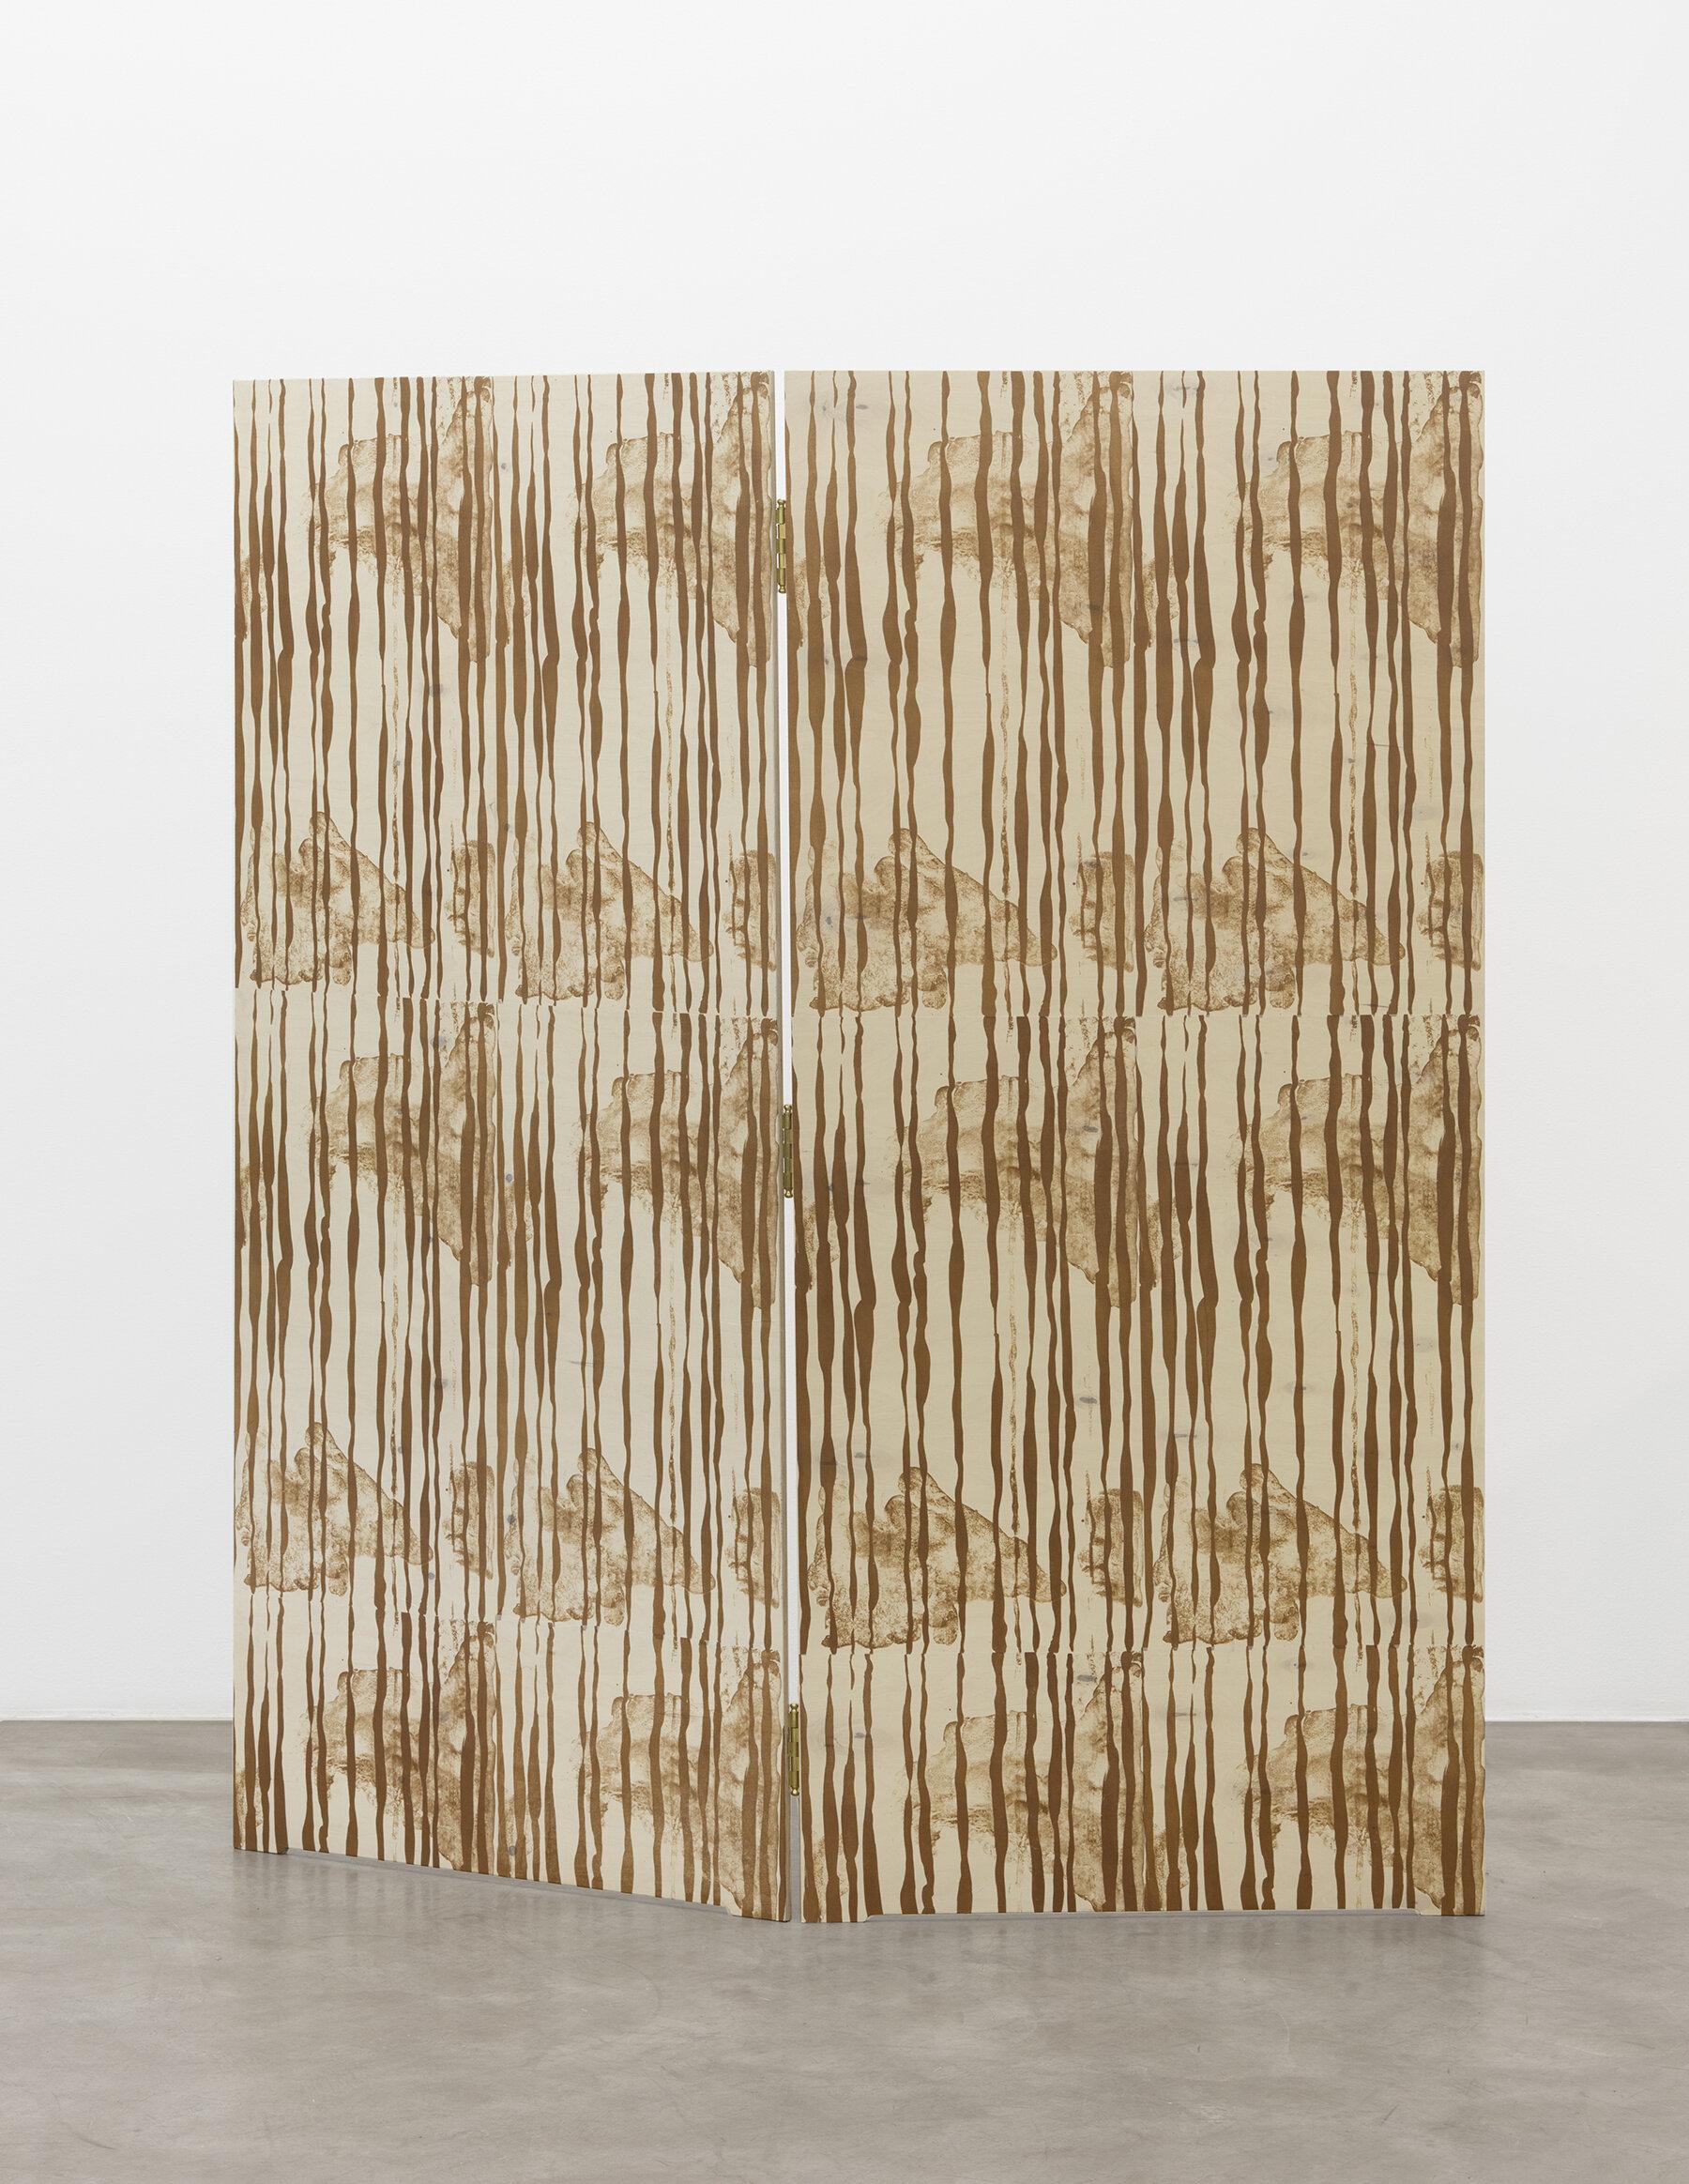 Karoliina_Hellberg_I'm Not Here_2019_litografia paperille_kiinnitetty puulle_170x150cm_GA6234.jpg